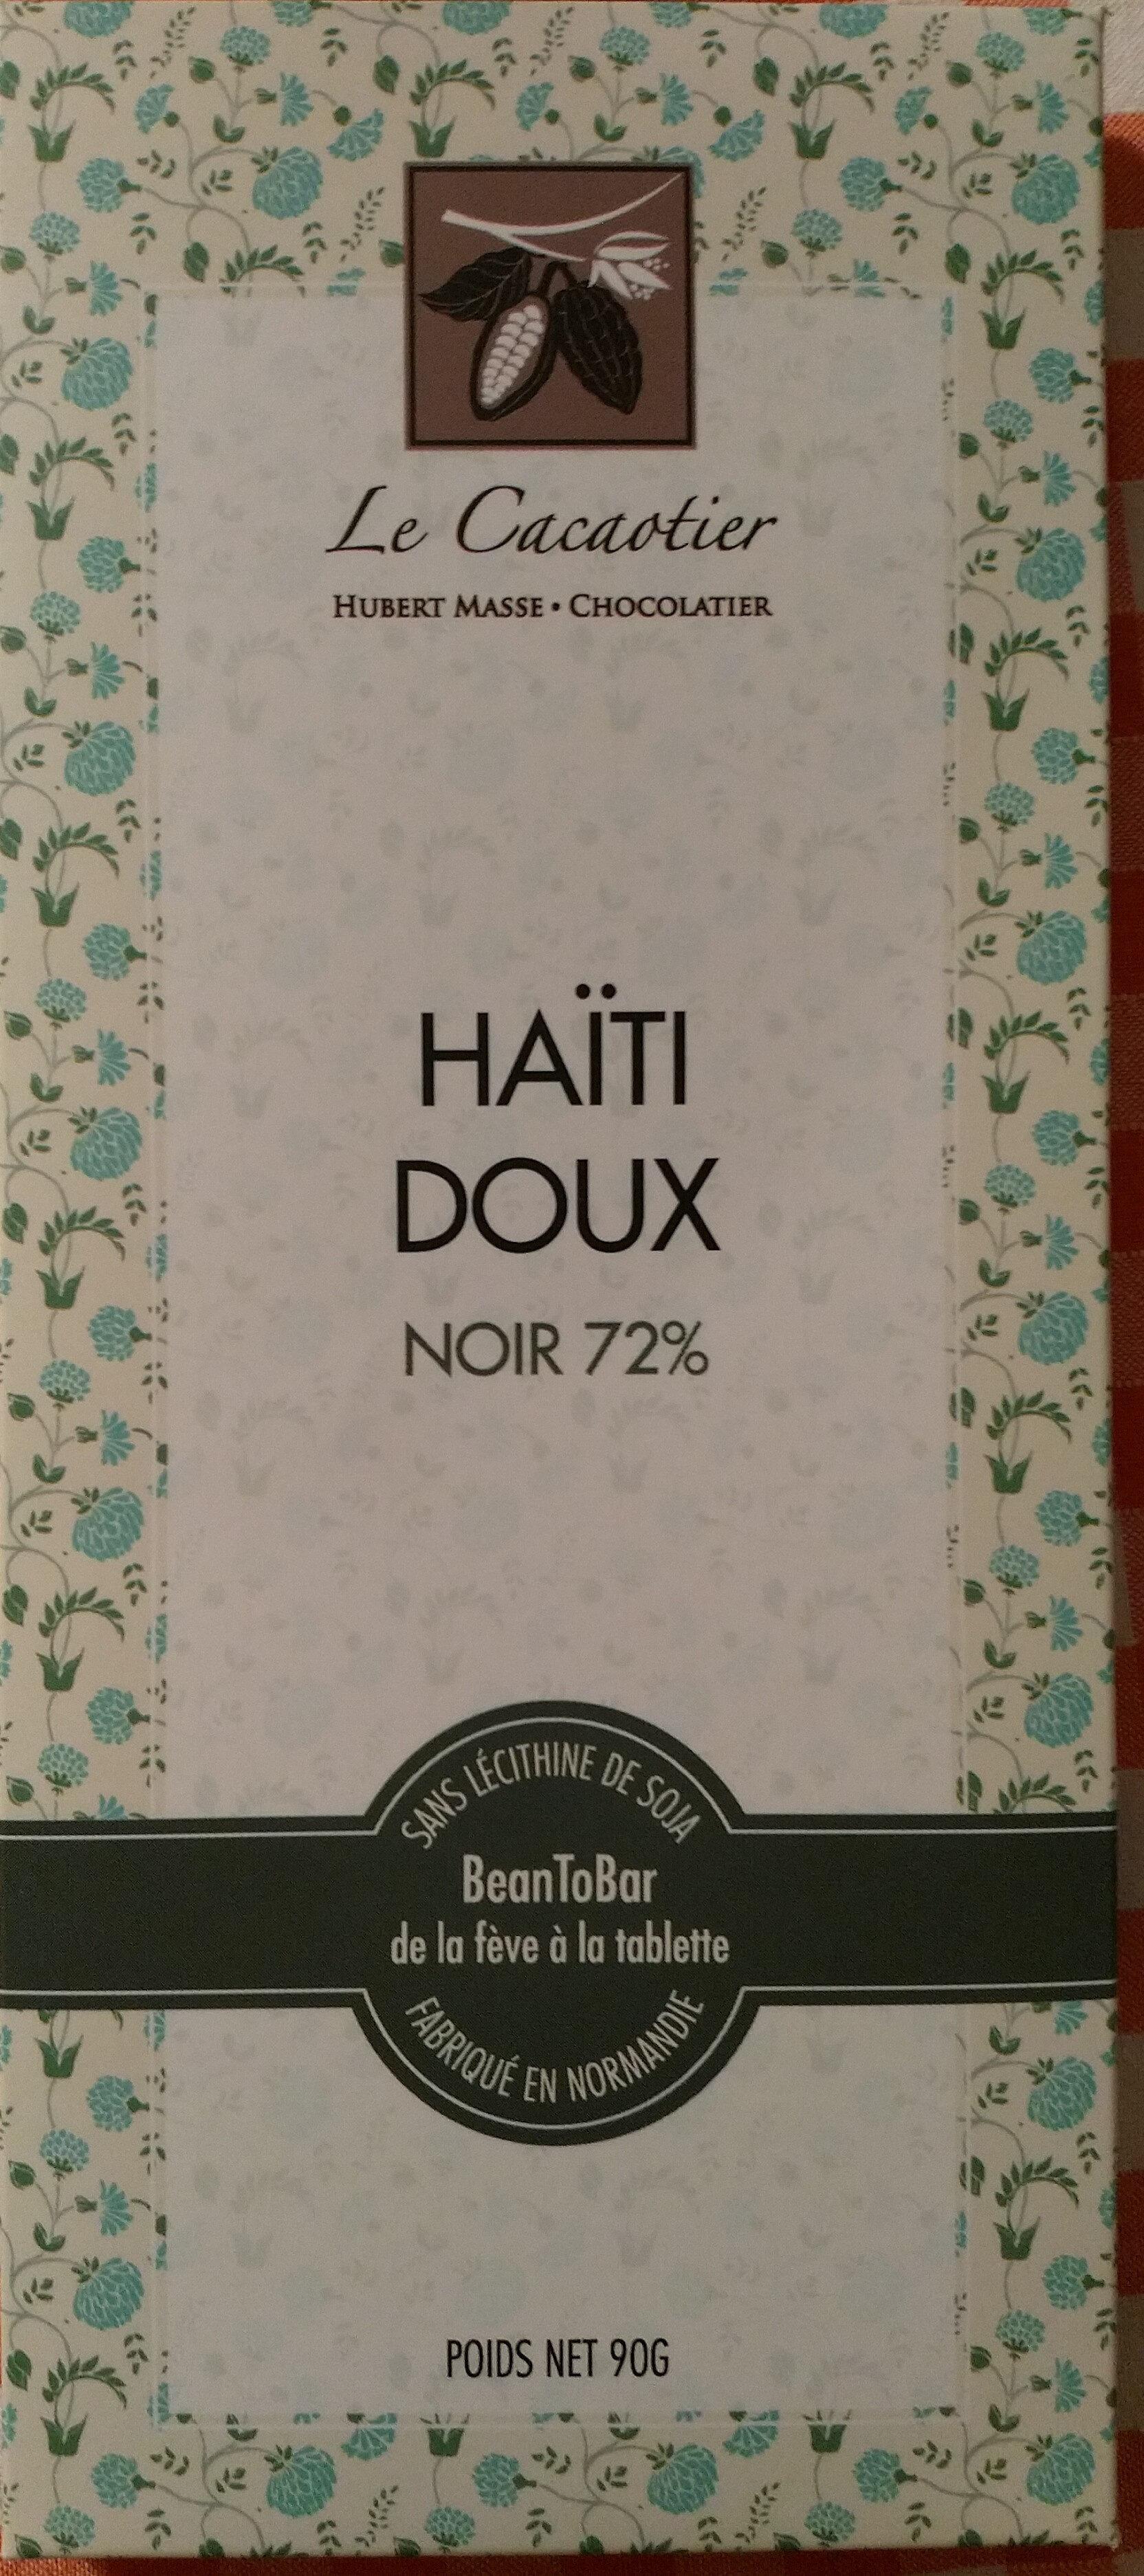 Chocolat Haïti Doux noir 72% - Product - fr